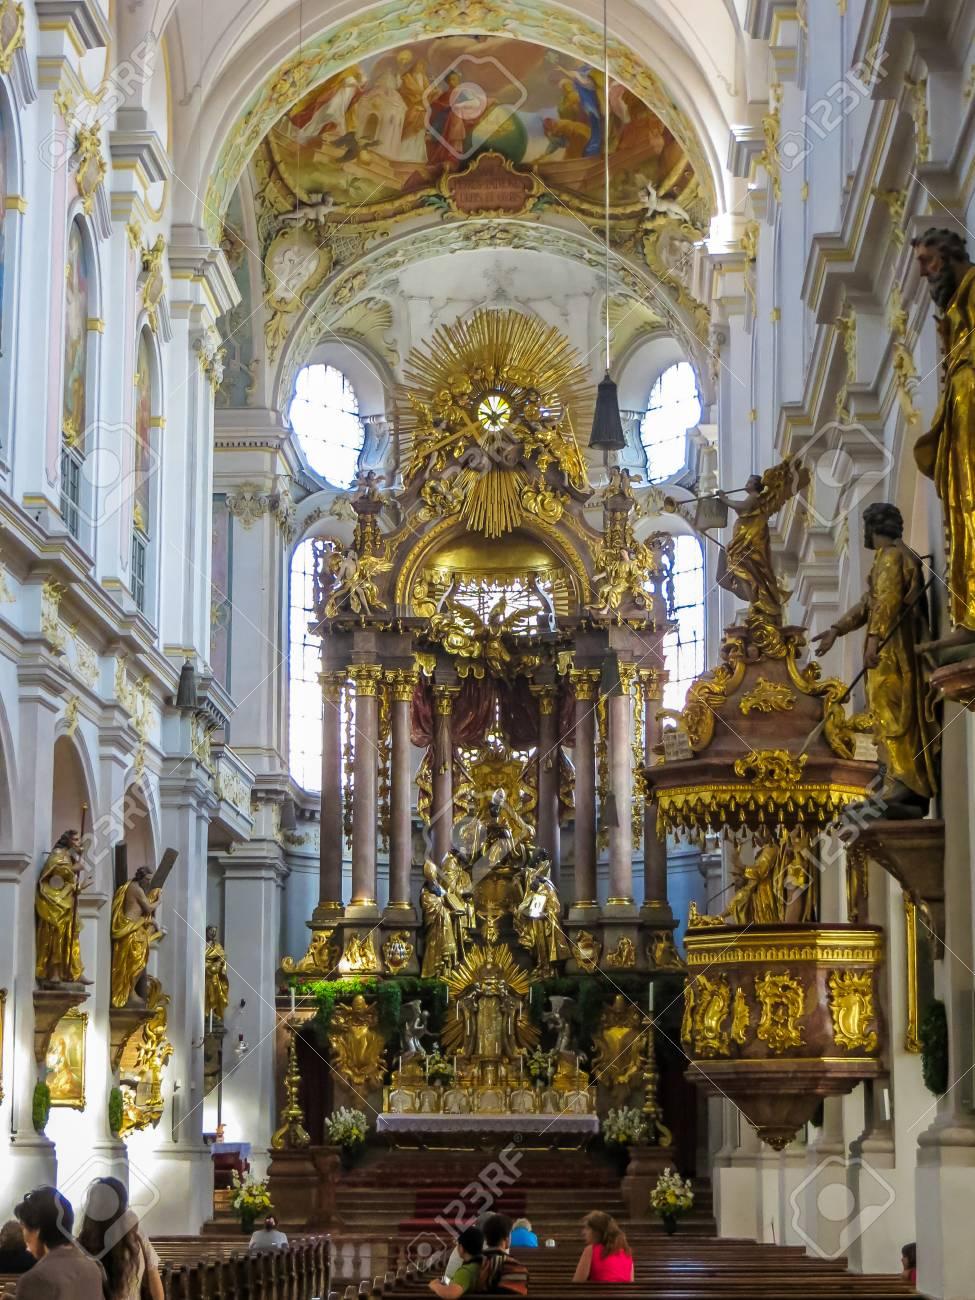 https://previews.123rf.com/images/legacy1995/legacy19951703/legacy1995170300421/73625762-munich-allemagne-st-peters-baroque-main-altar-int%C3%A9rieur.jpg